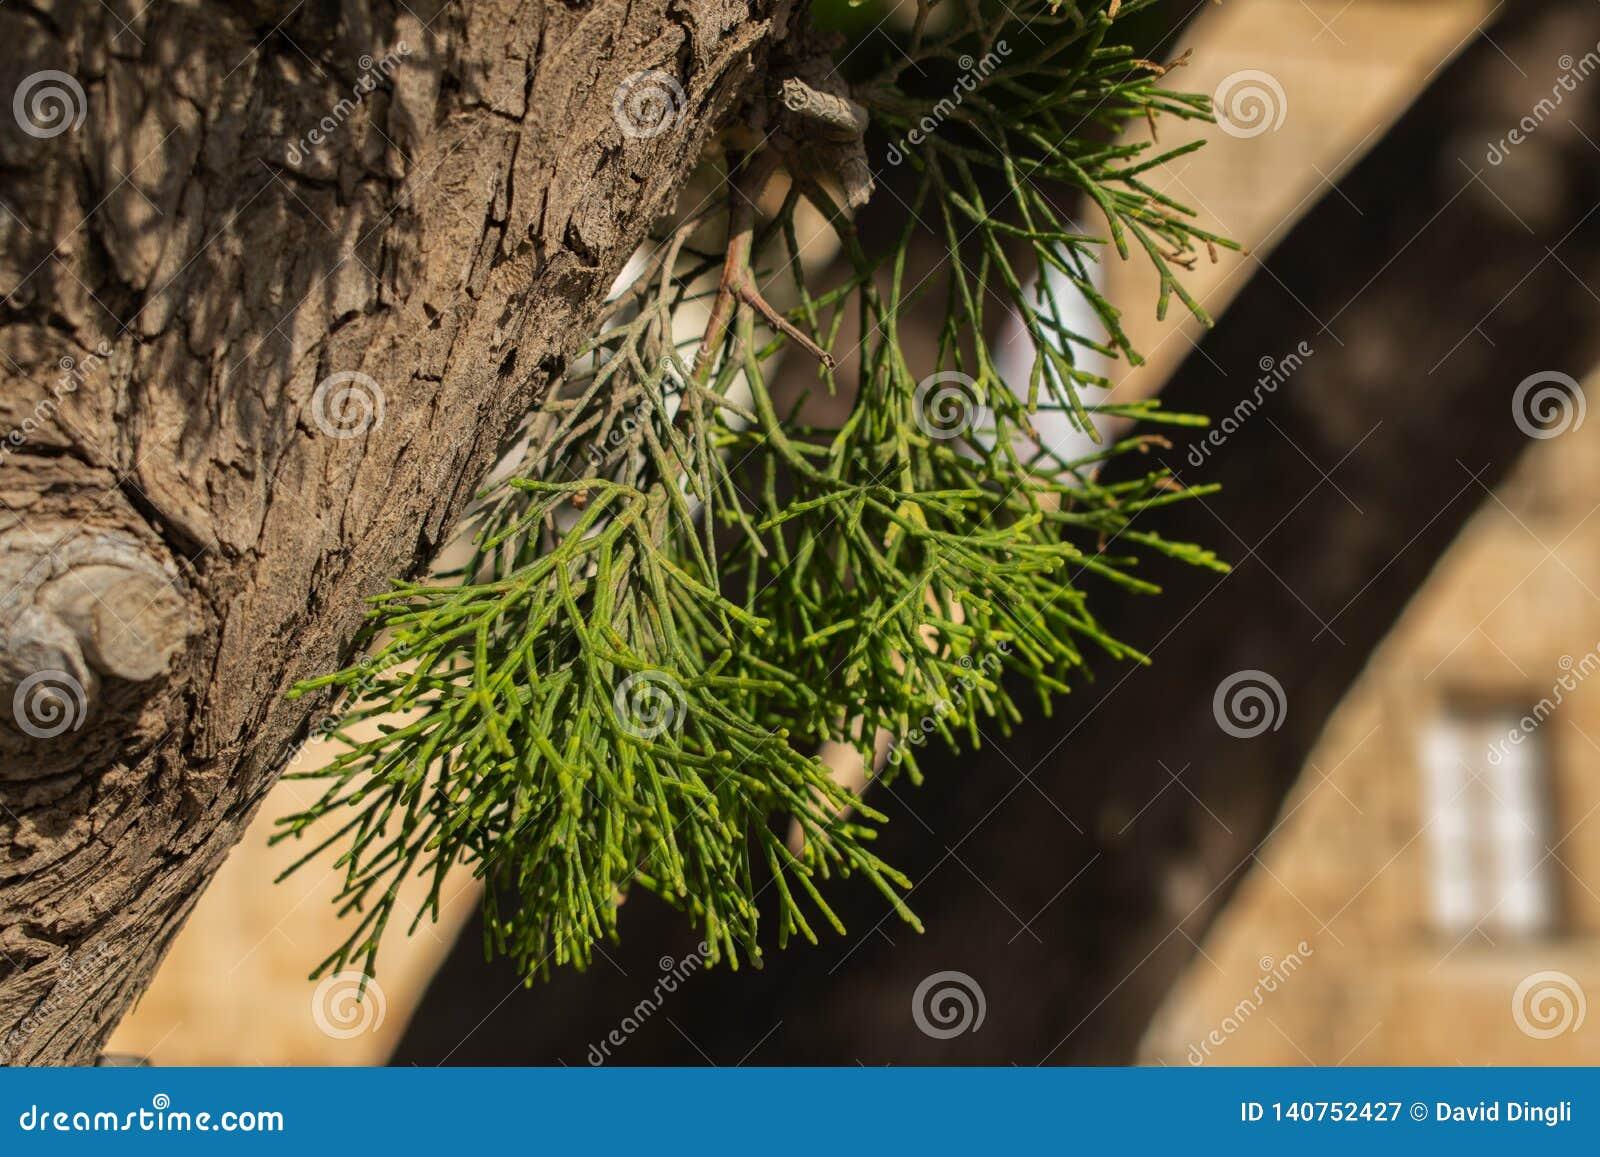 Pine tree leaves macro shot